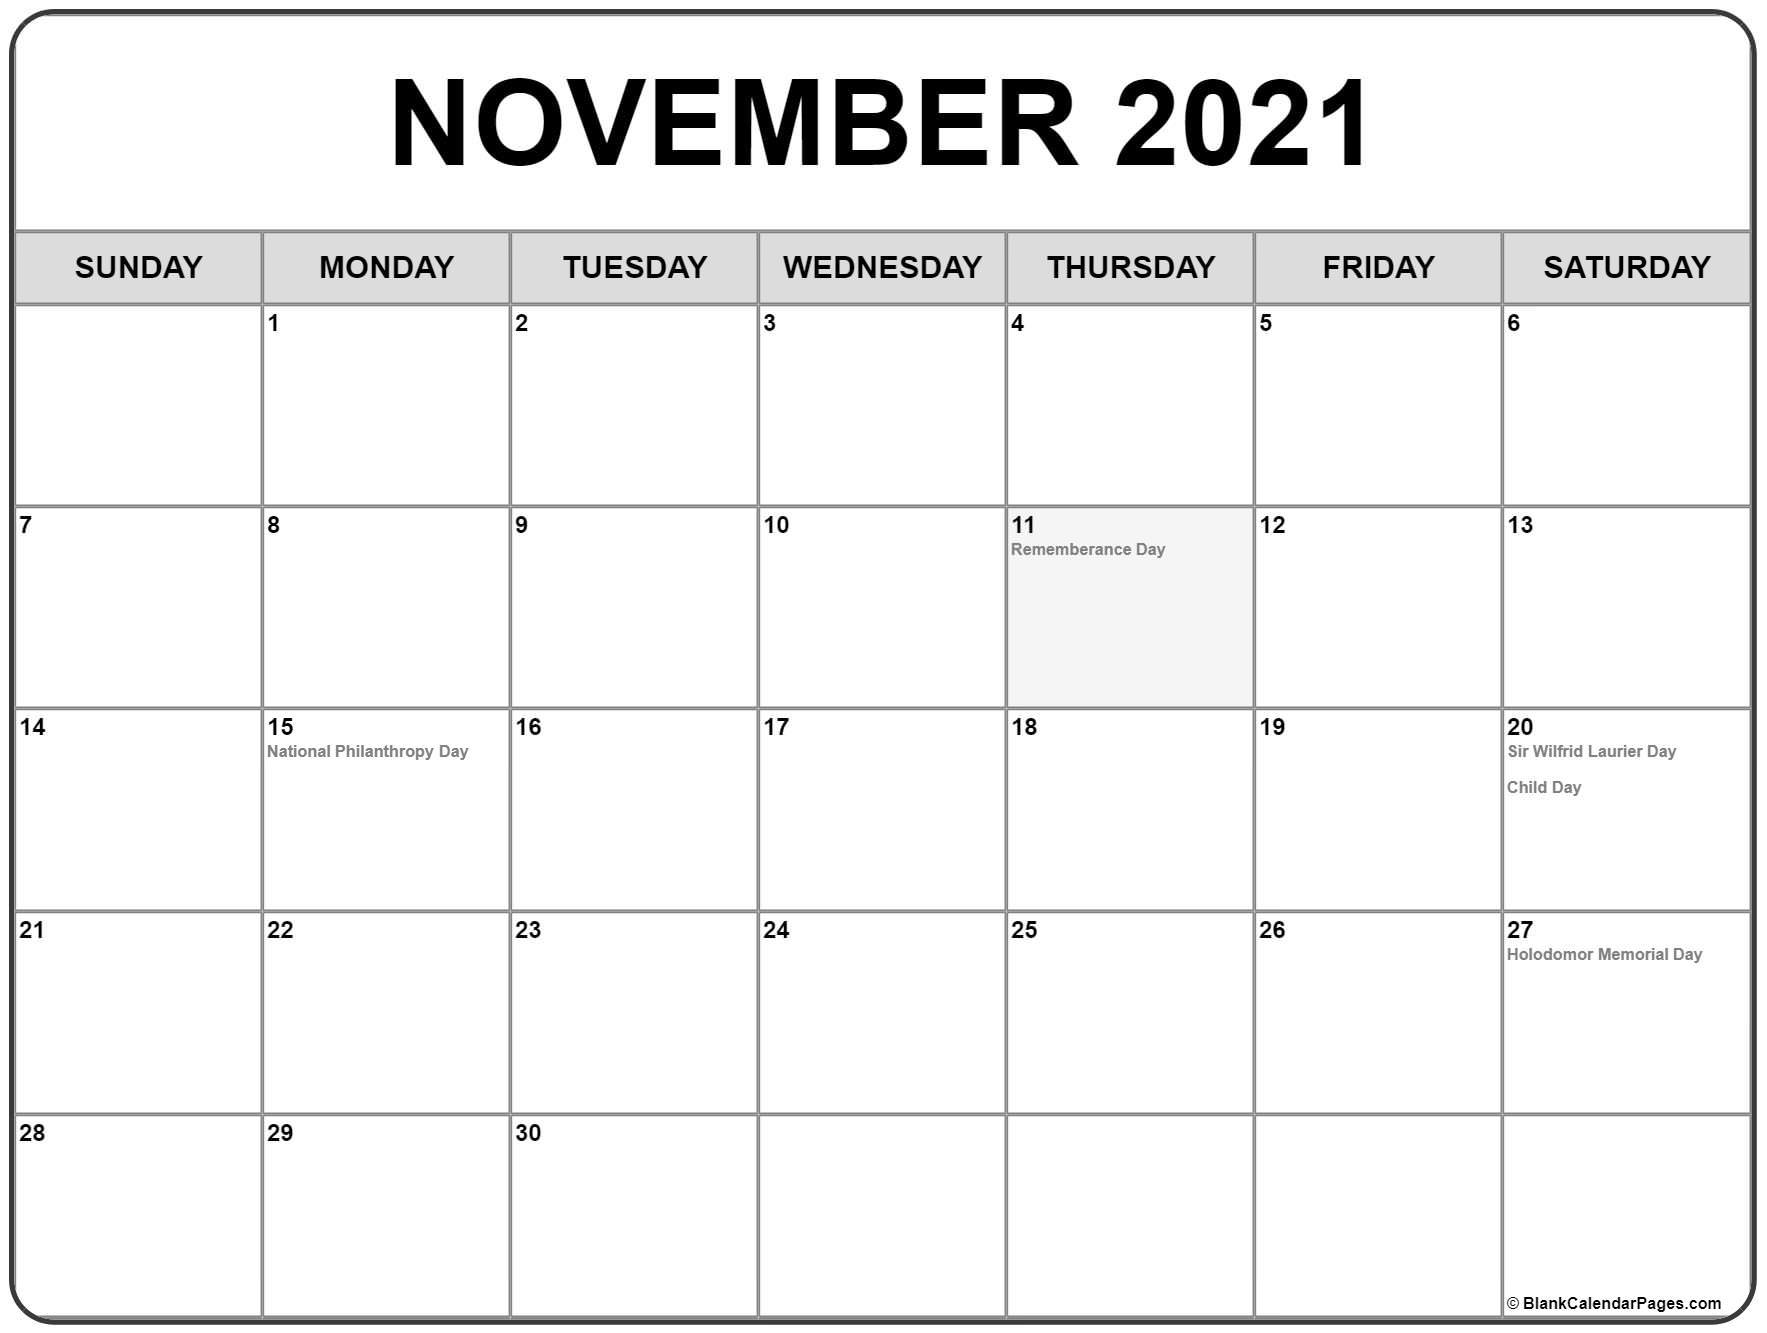 Catch November 2021 Calendar